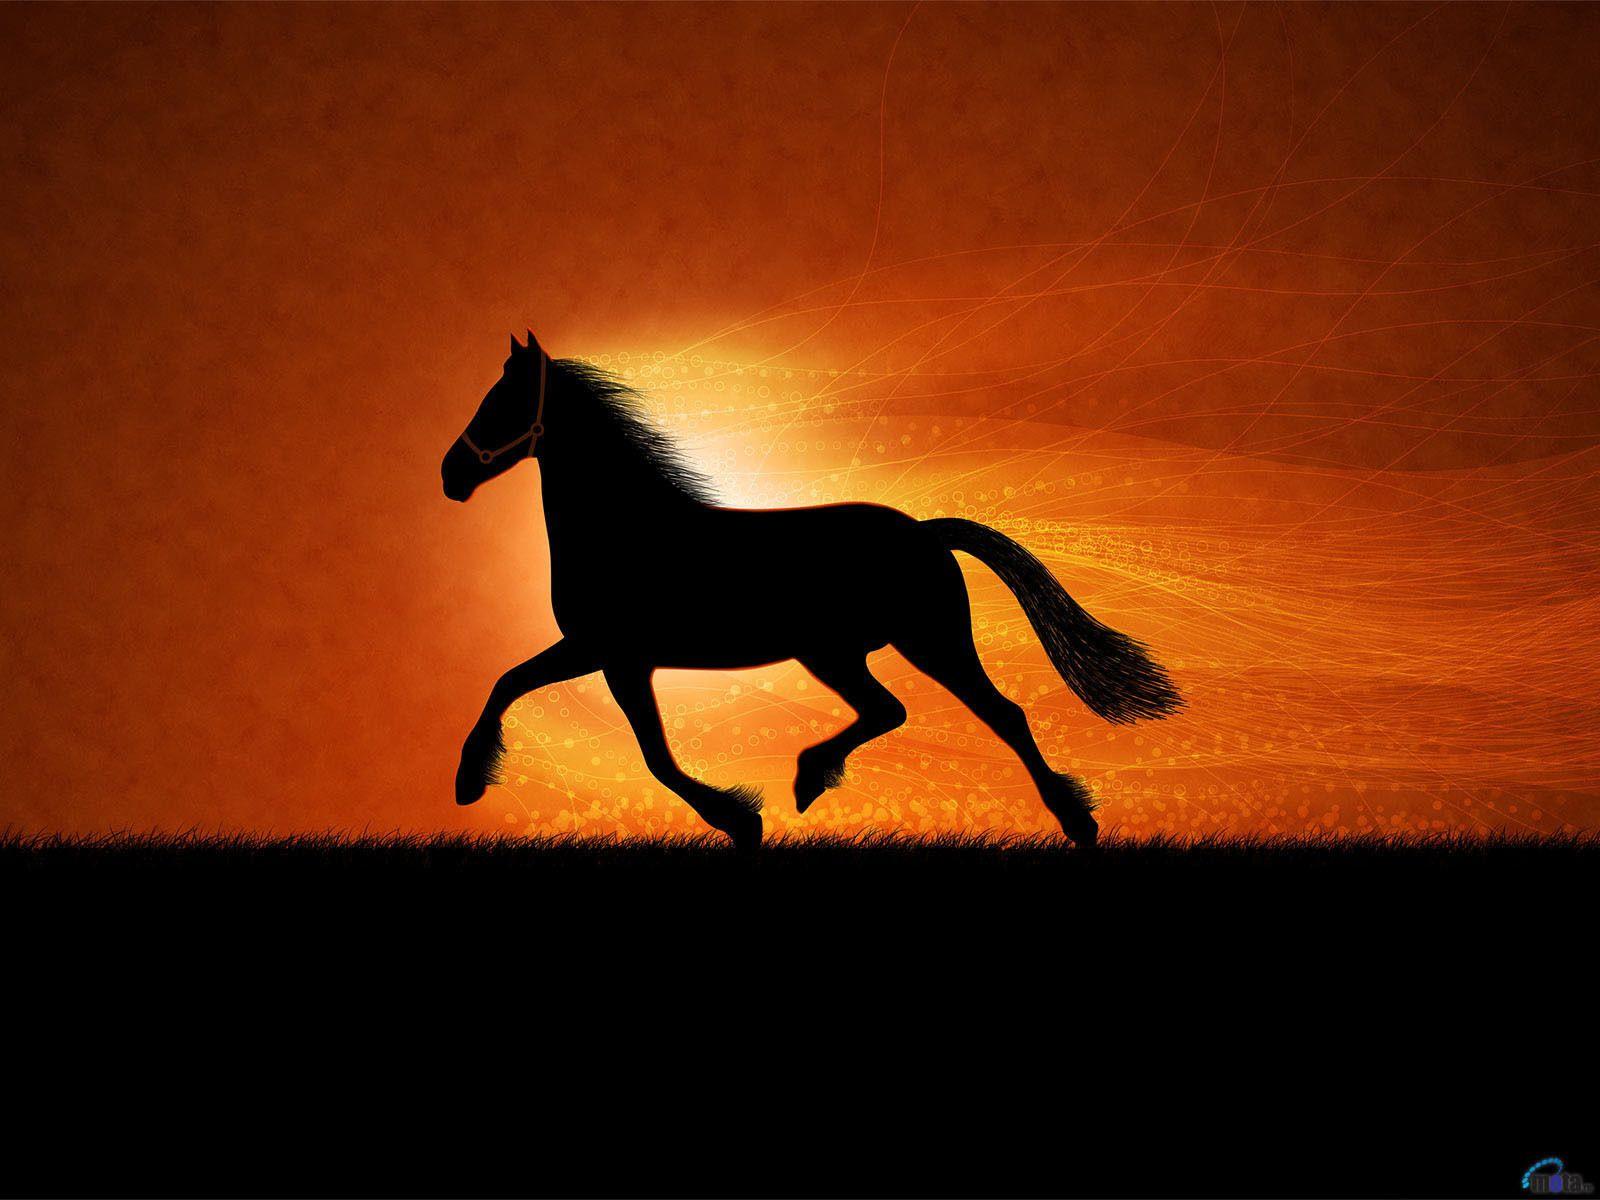 Horse Wallpaper Desktop wallpaper wallpaper hd Horse Horse 1600x1200